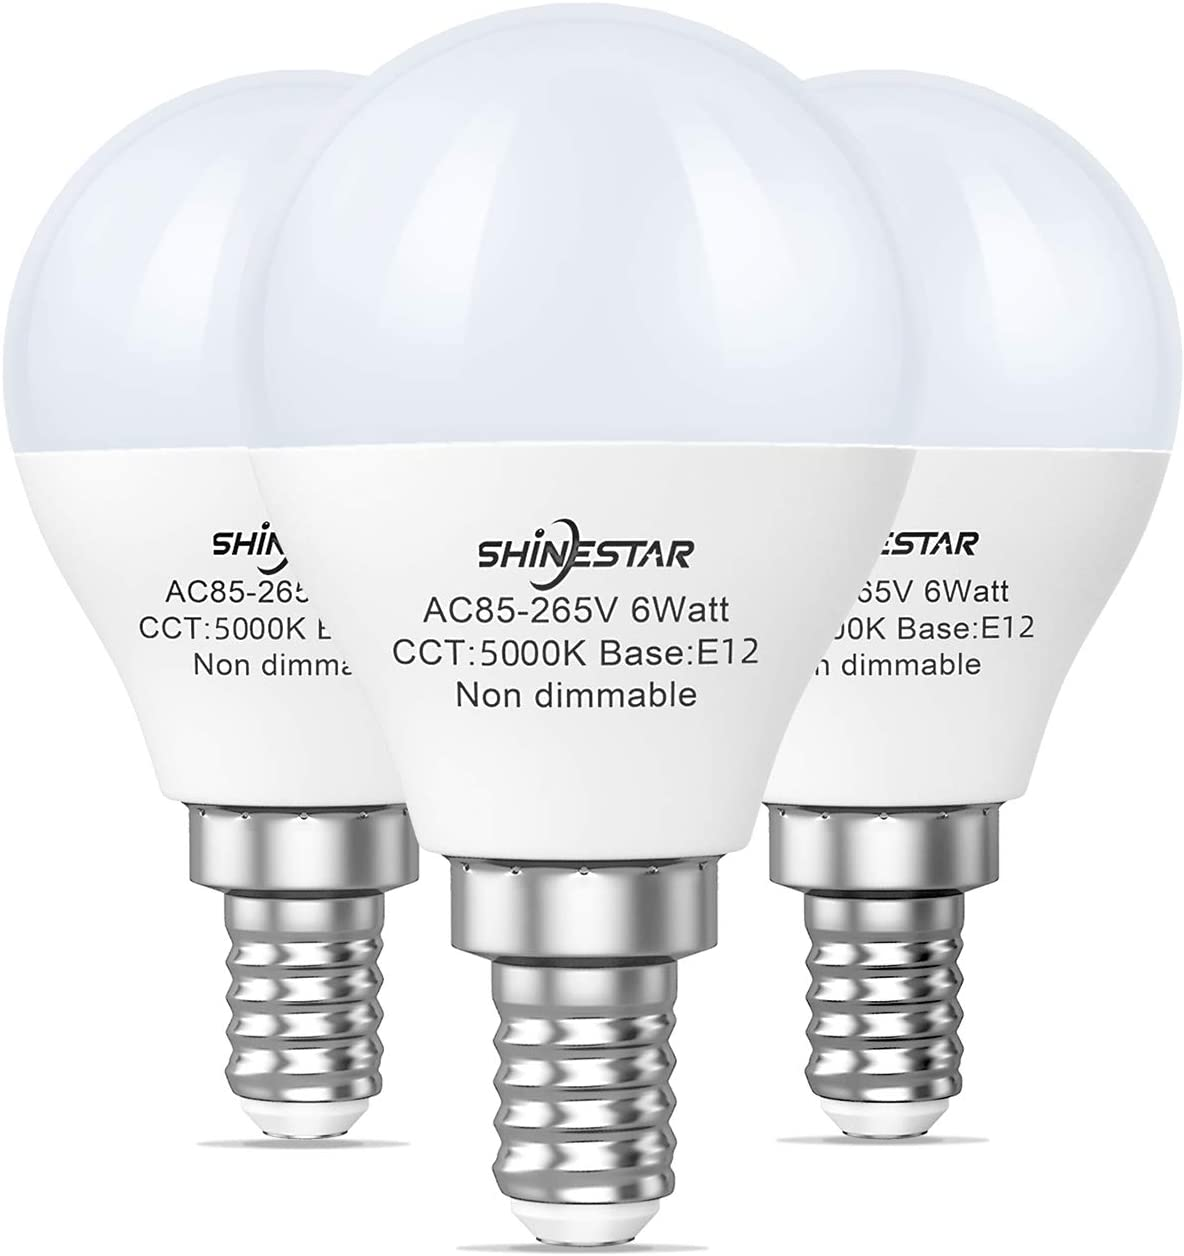 Amazon Com Shinestar 3 Pack E12 Led Ceiling Fan Light Bulbs 60 Watt Equivalent 120v Daylight White 5000k A15 E12 Led Bulb With Candelabra Base Small Round Light Bulb For Vanity Non Dimmable Home Improvement